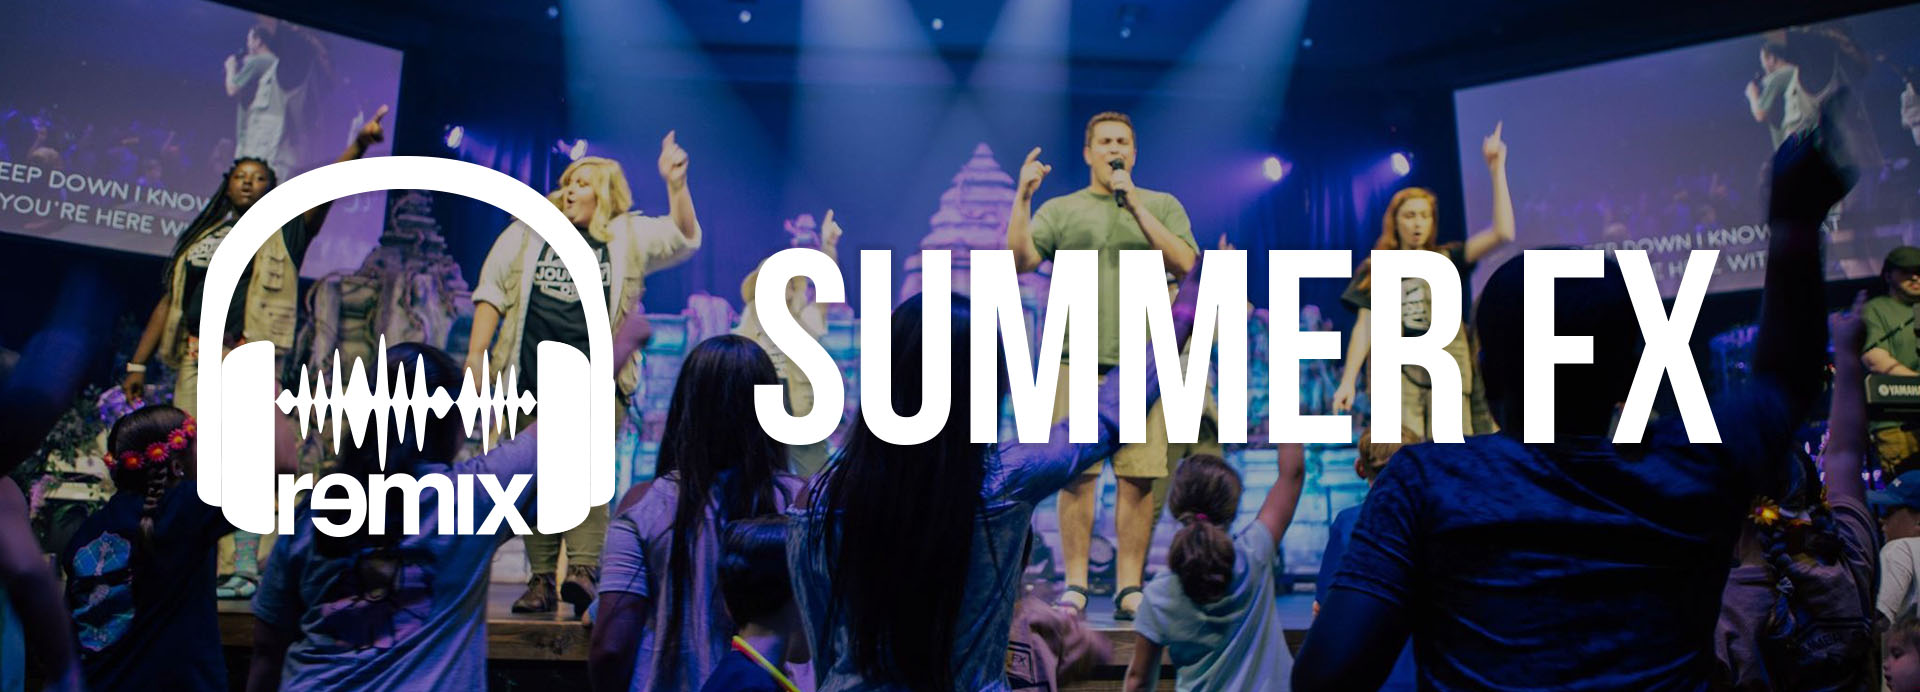 Summer FX Banner.jpg